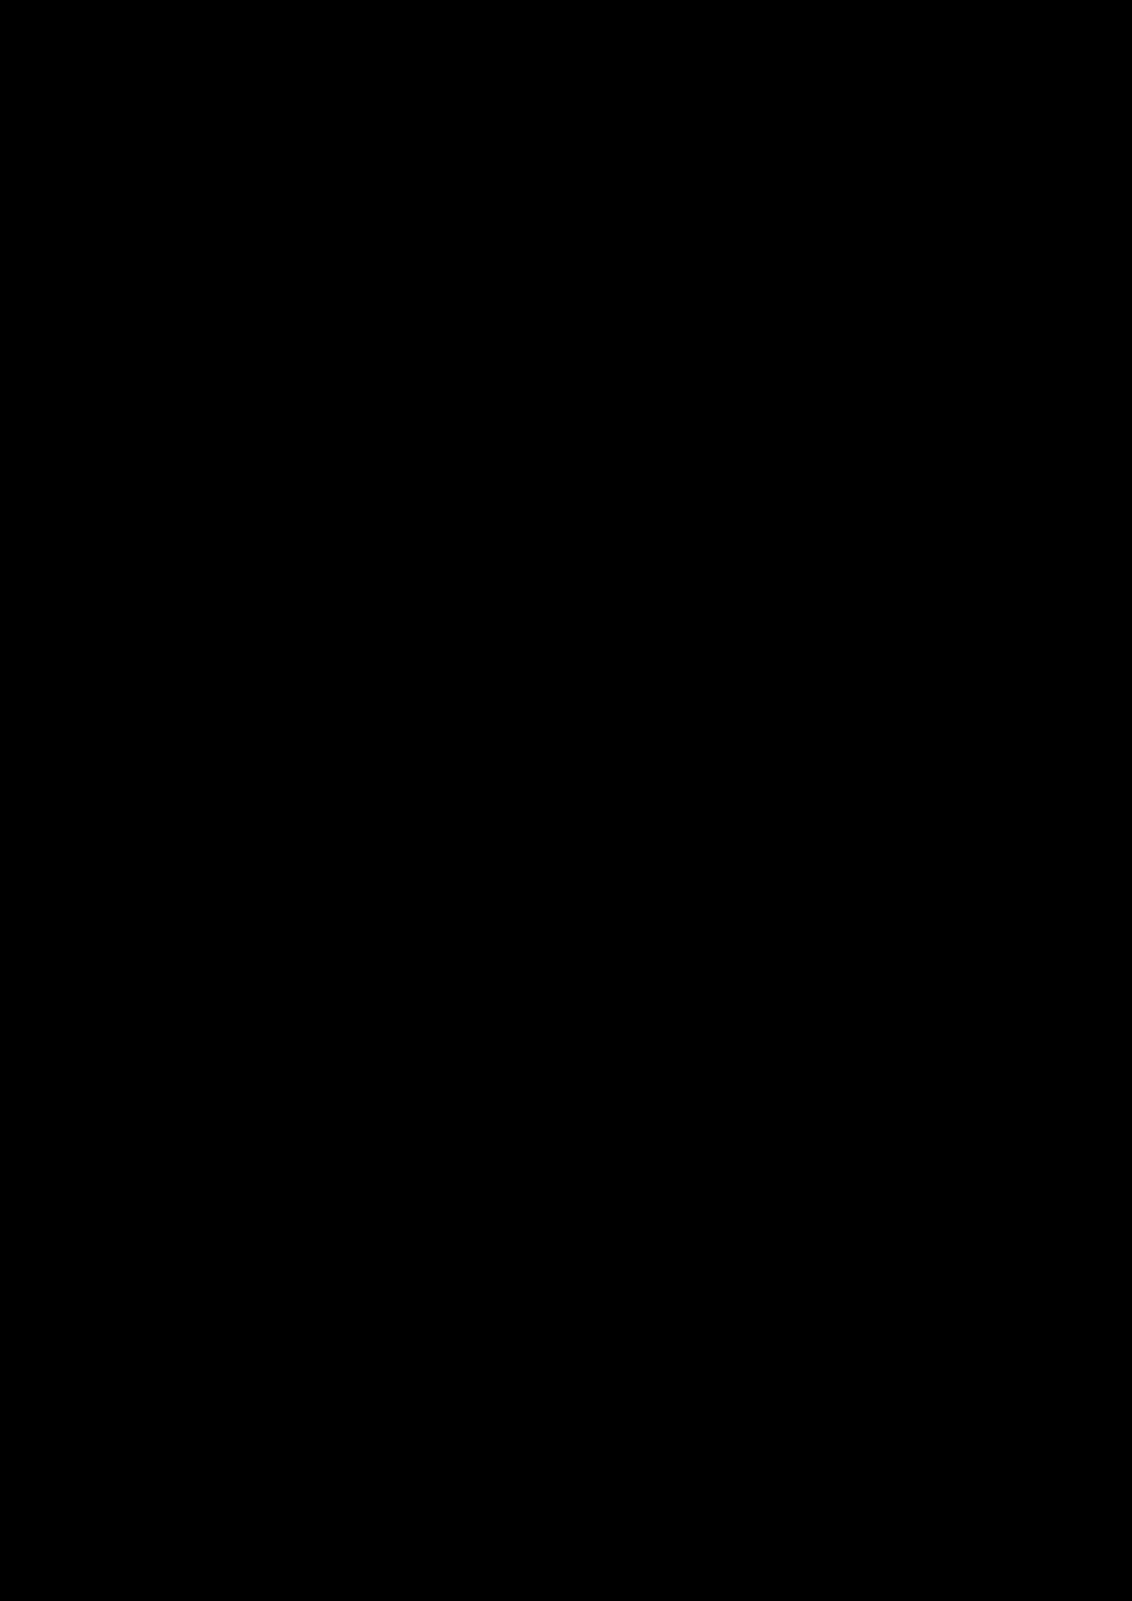 Ispoved Pervogo Boga slide, Image 44